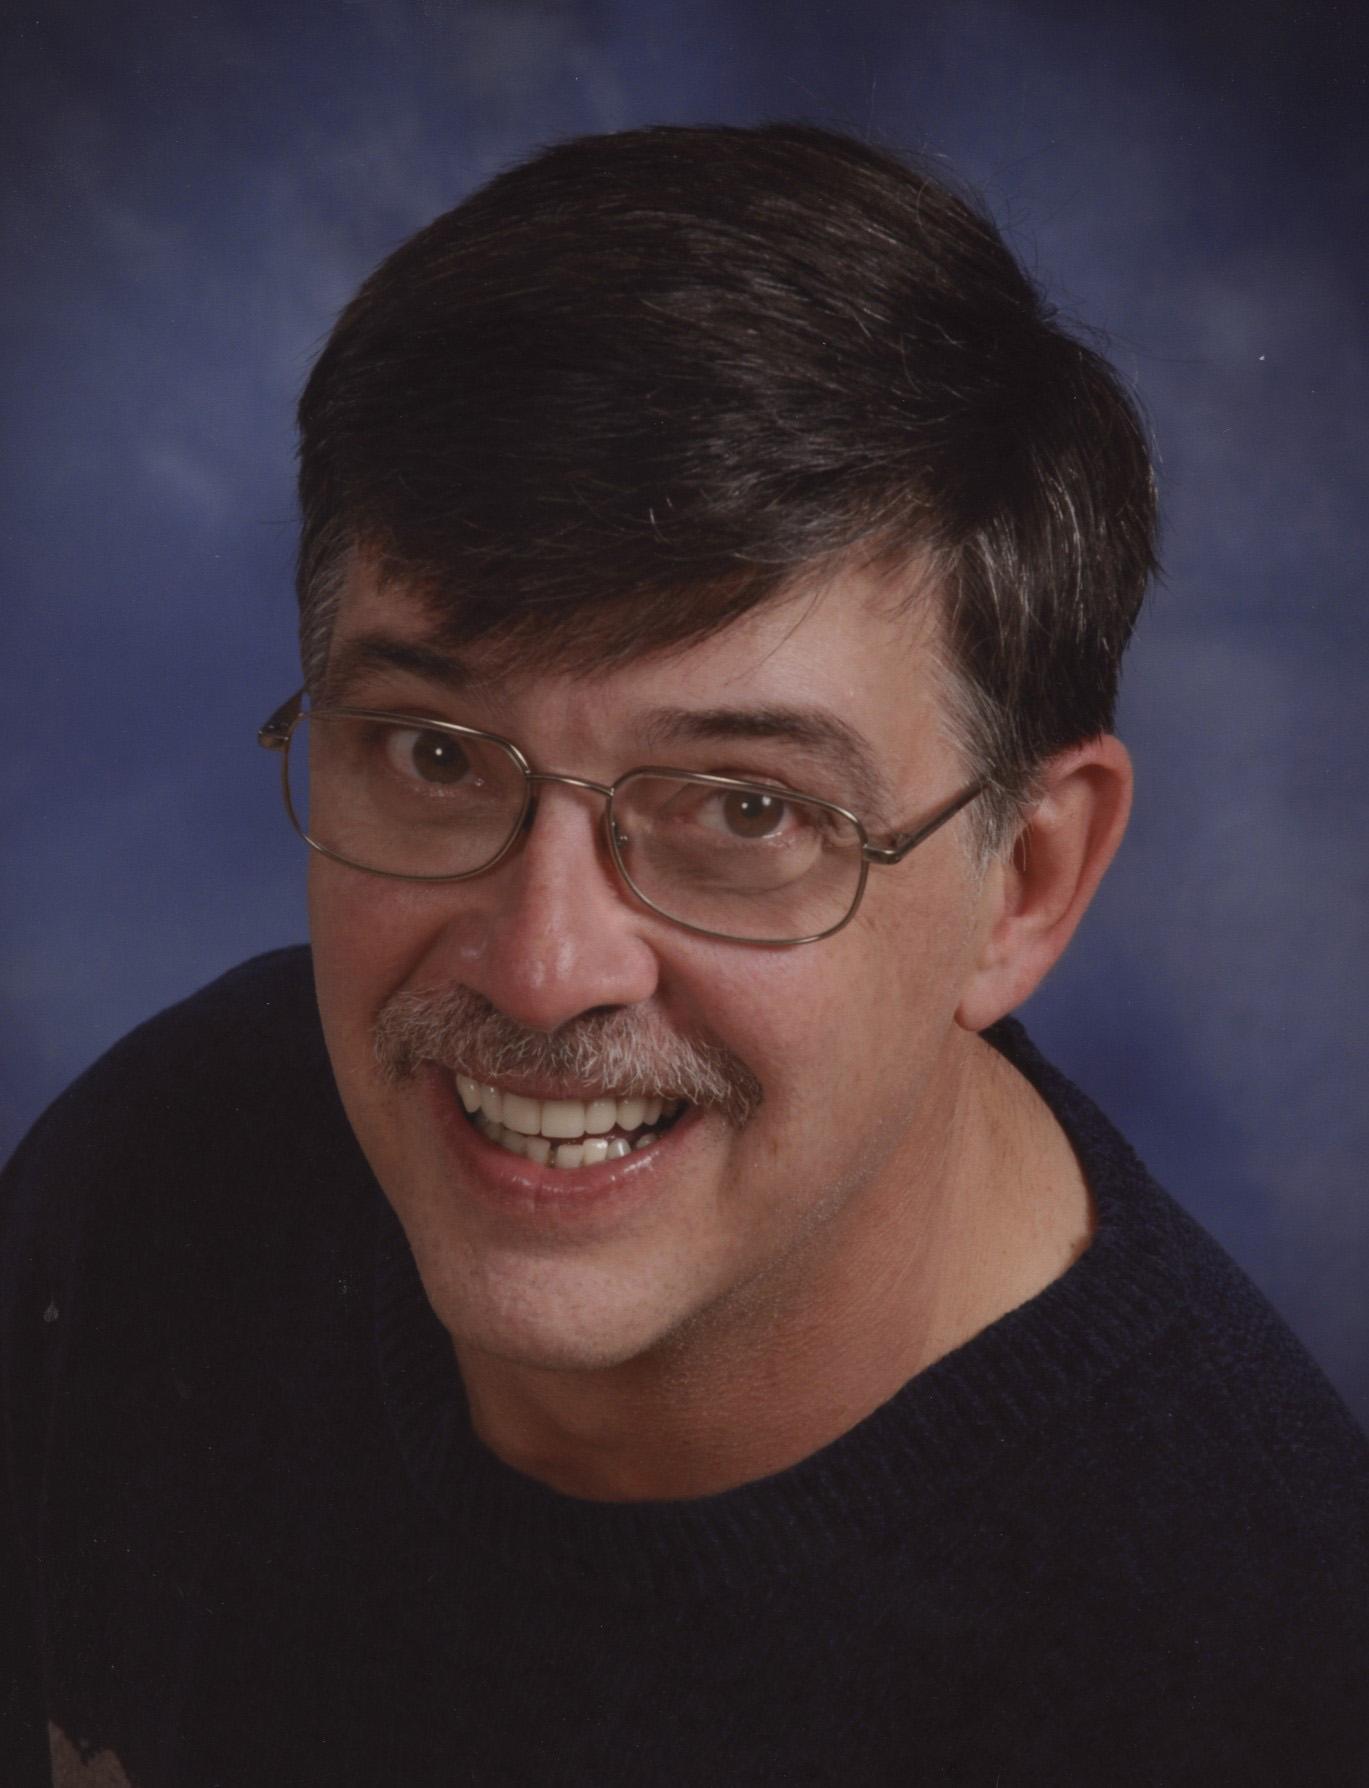 Don Rene Mangel, age 60, of Holland